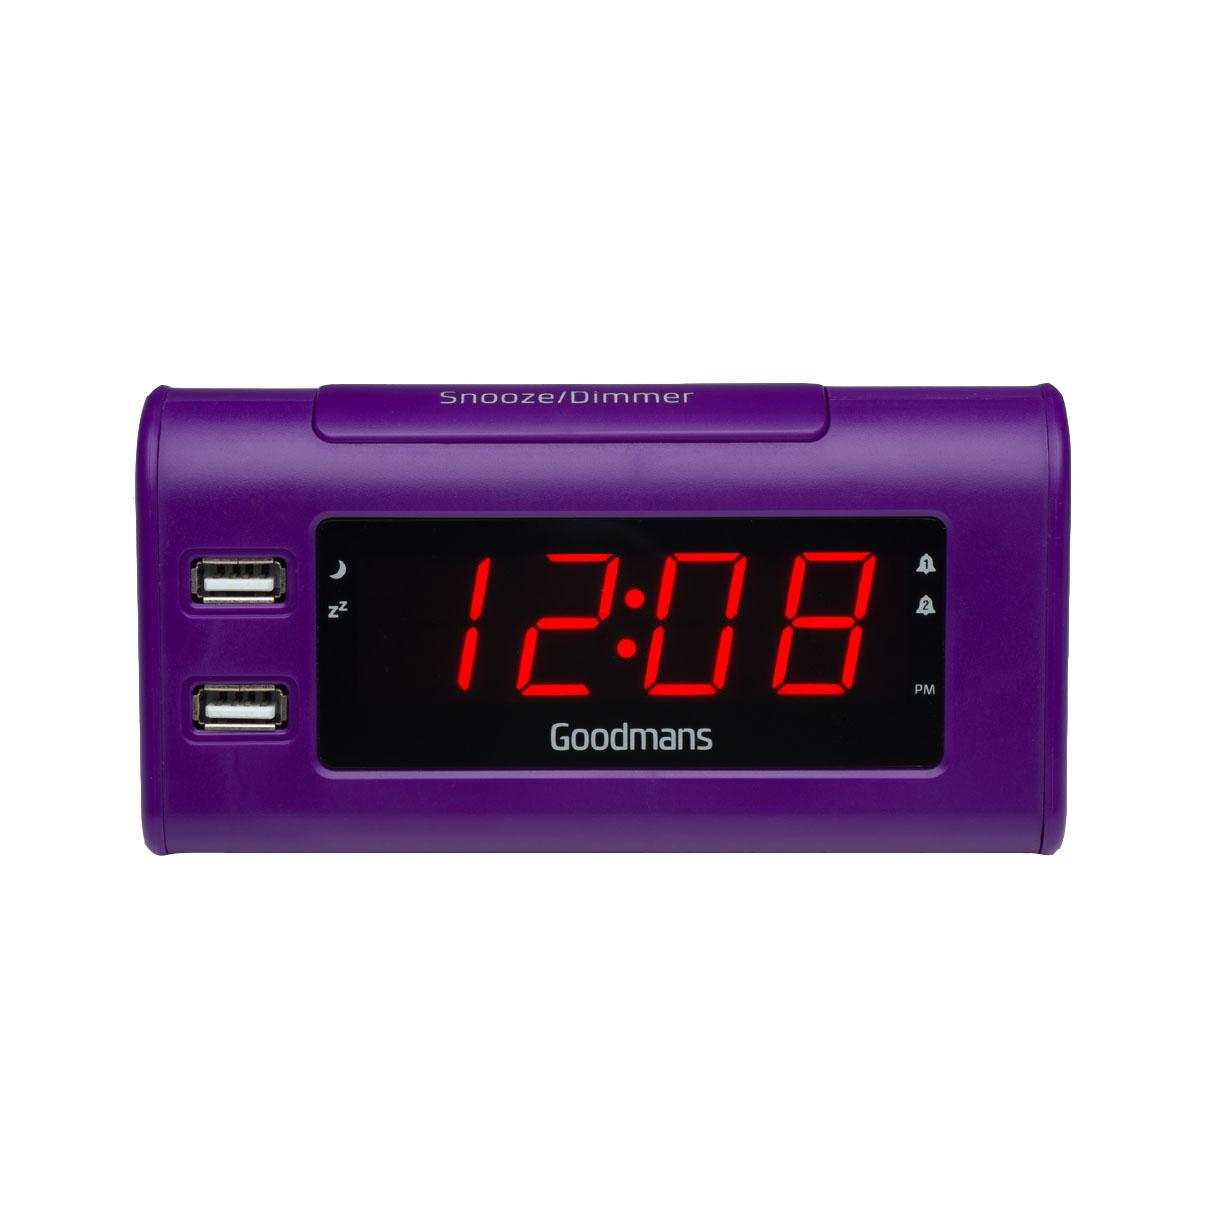 nod digital fm radio alarm clock with usb charging goodmans nod dab digital fm radio alarm. Black Bedroom Furniture Sets. Home Design Ideas